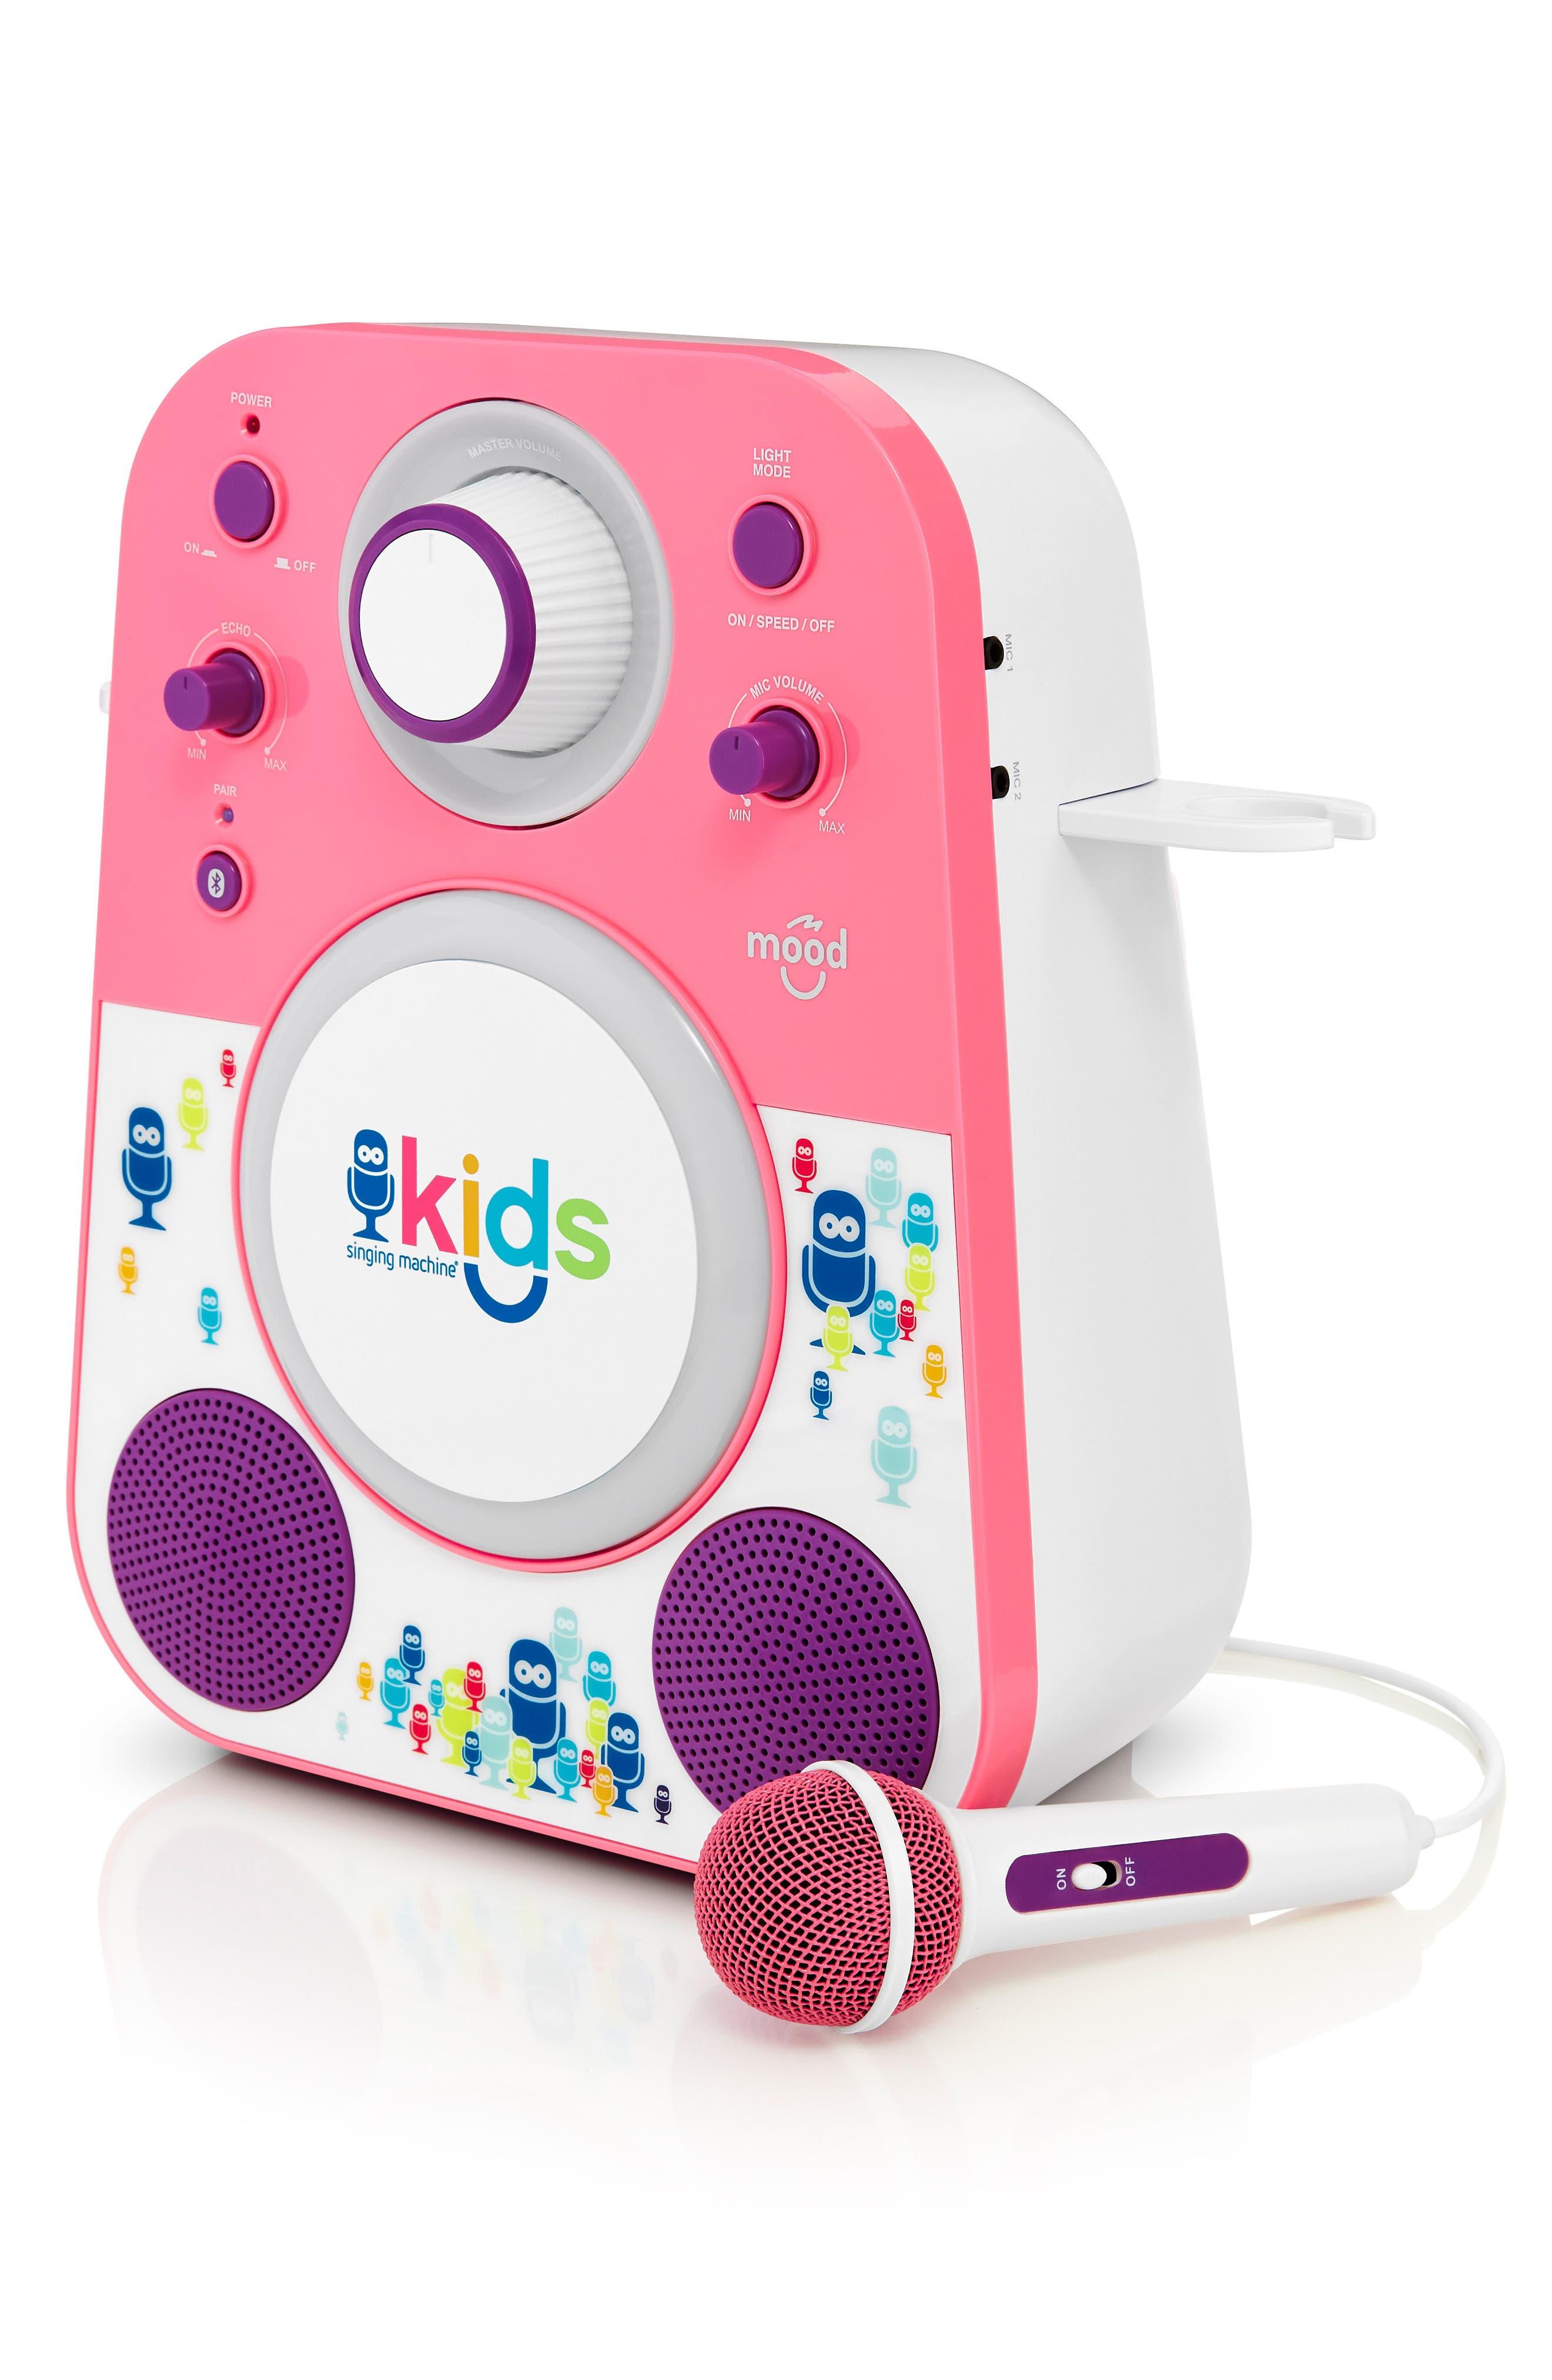 Kids Mood Karaoke System,                             Alternate thumbnail 6, color,                             PINK PURPLE